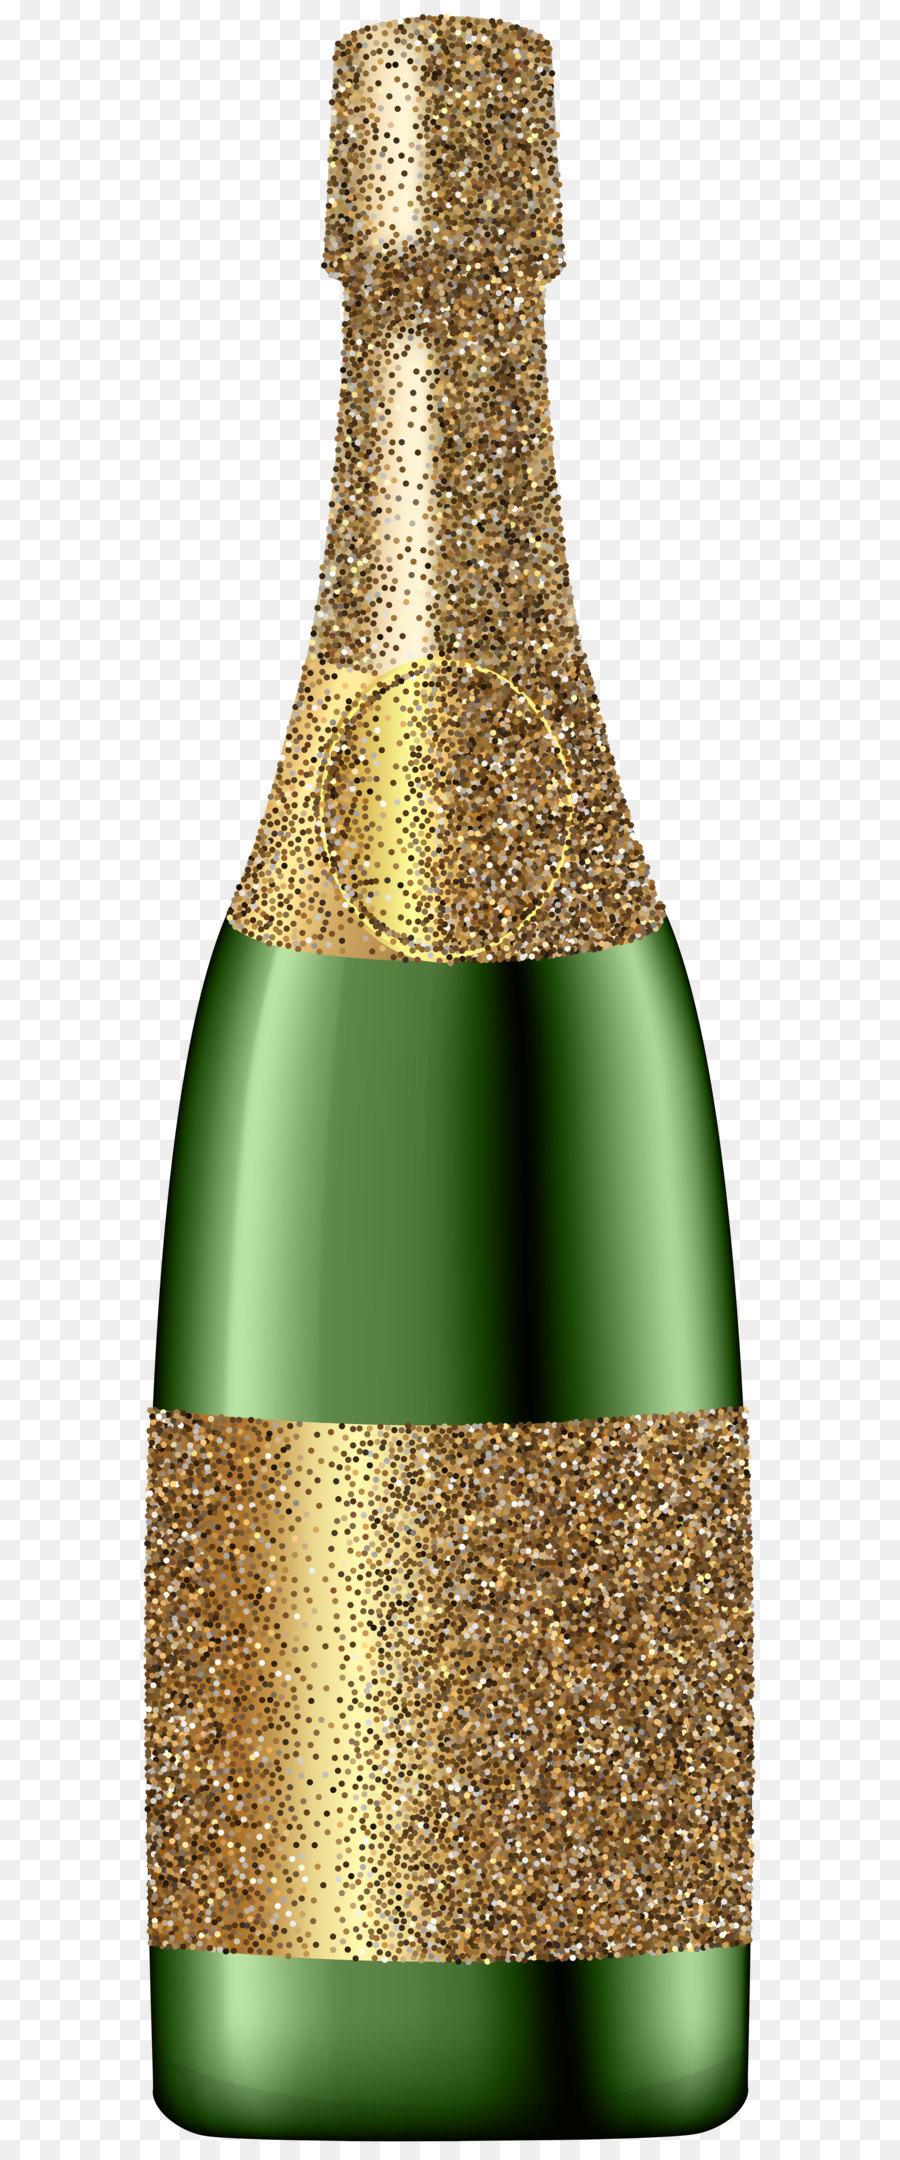 red wine champagne bottle clip art glitter champagne bottle png rh kisspng com champagne bottle clipart black and white champagne bottle clipart